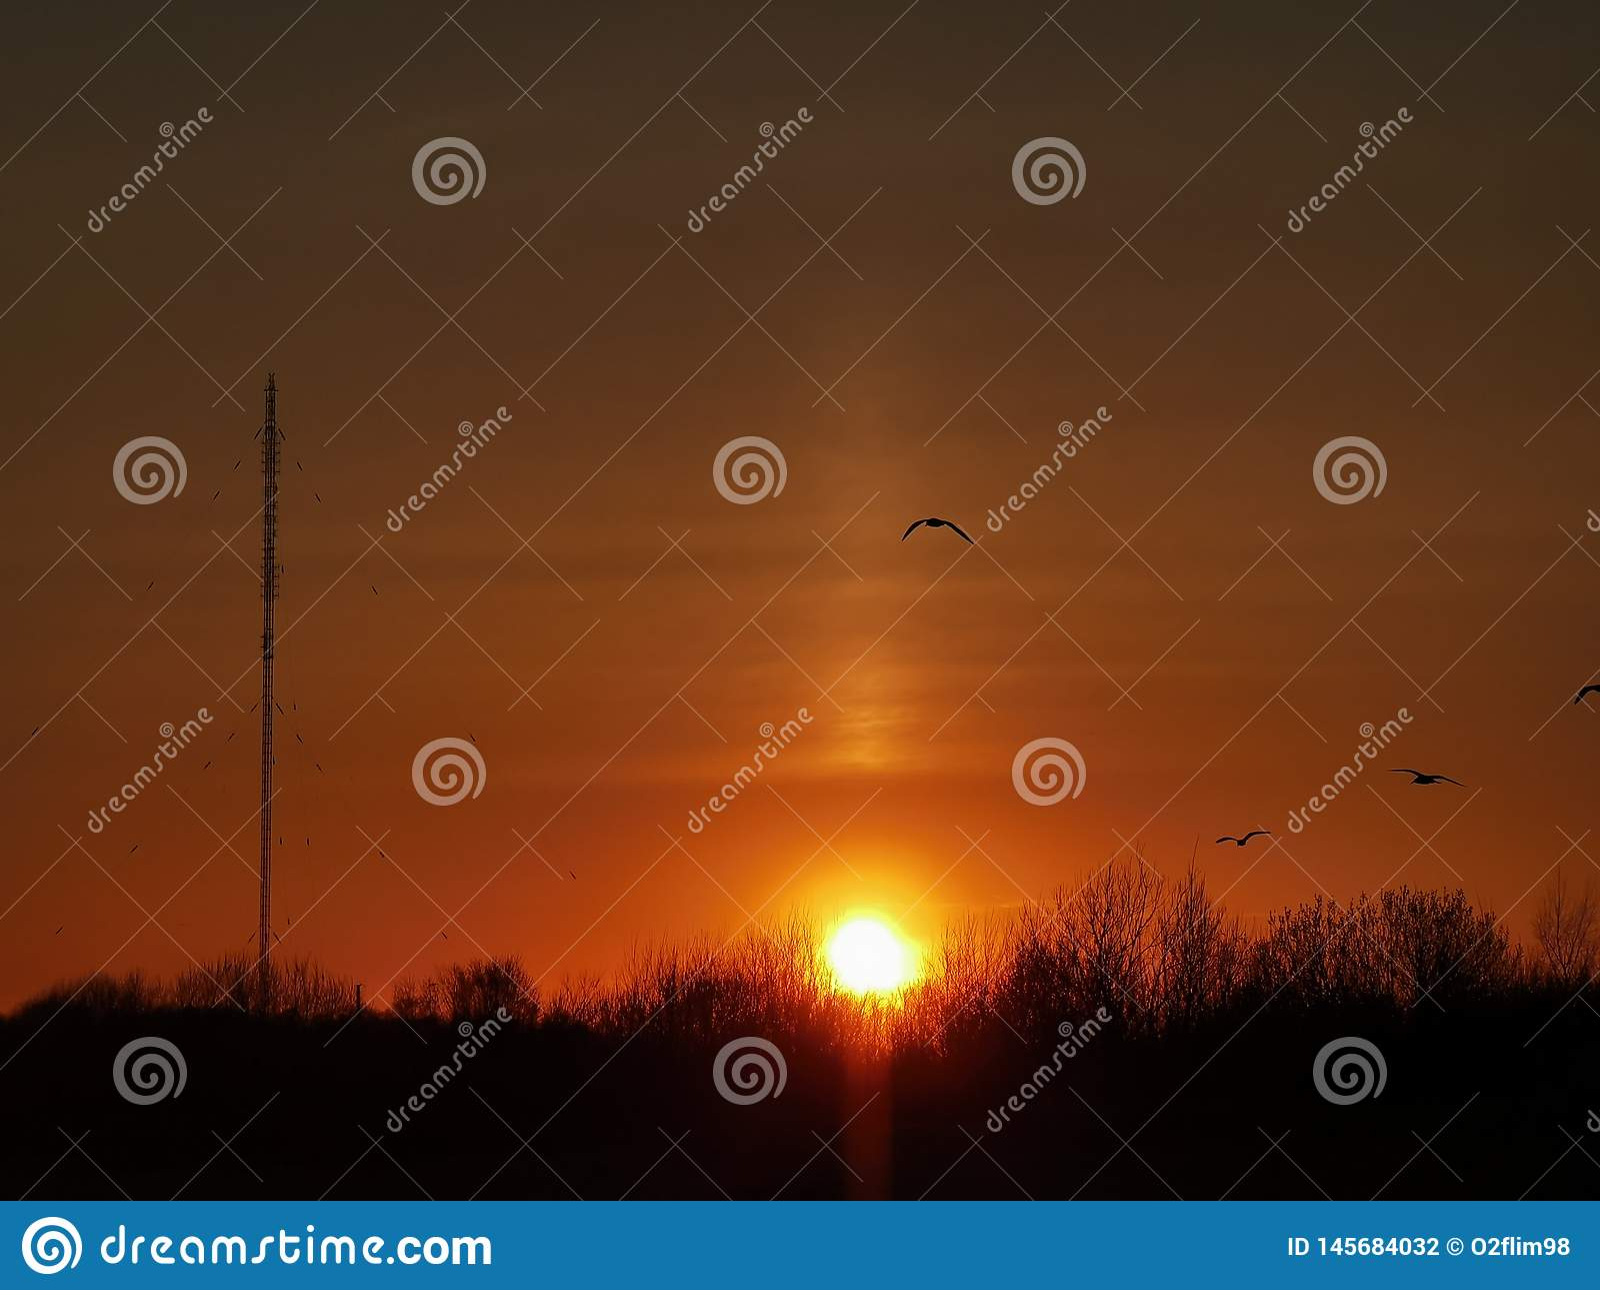 Birds fly through sunset